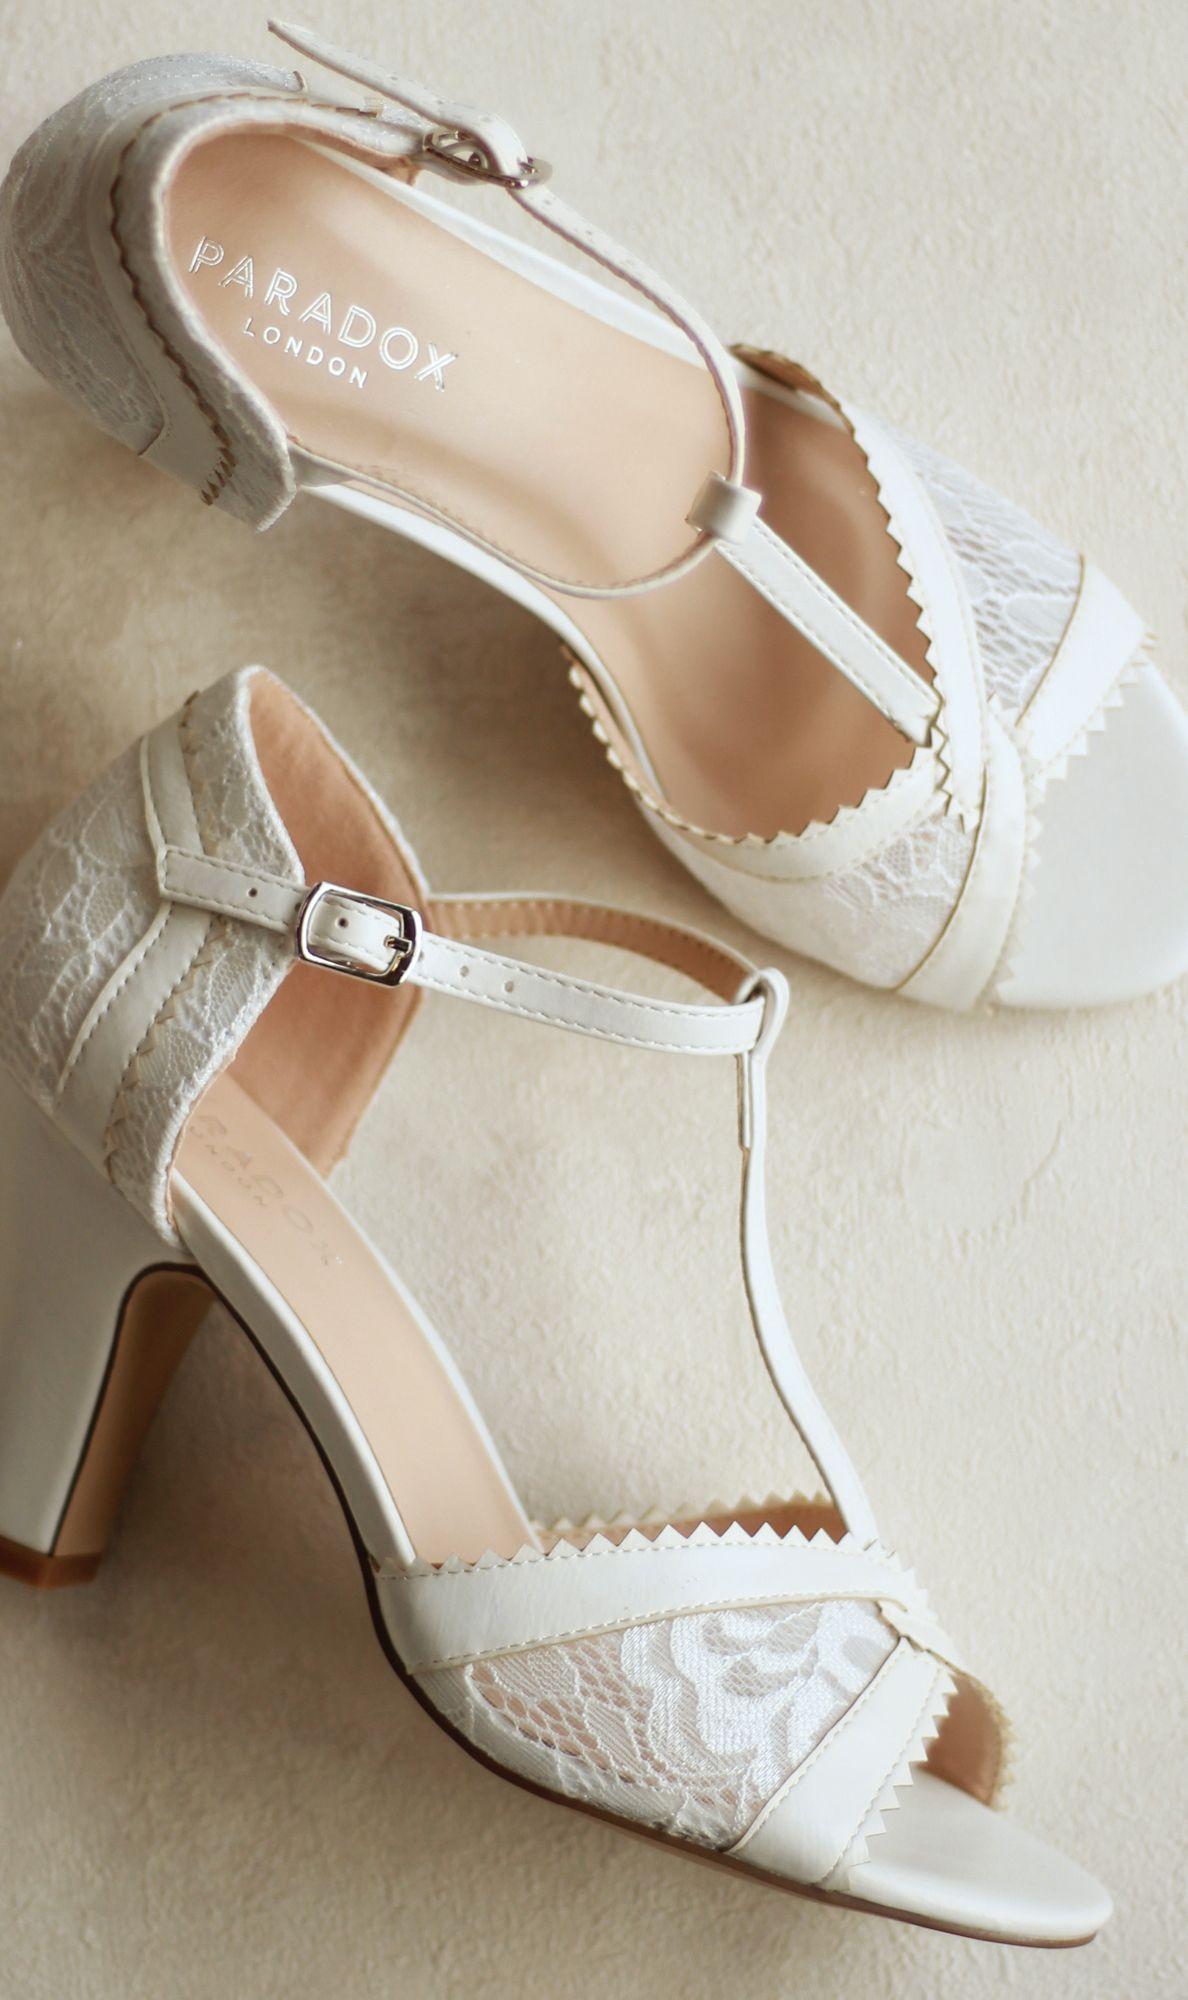 Paradox London Modern, Affordable & Stylish Wedding Shoes